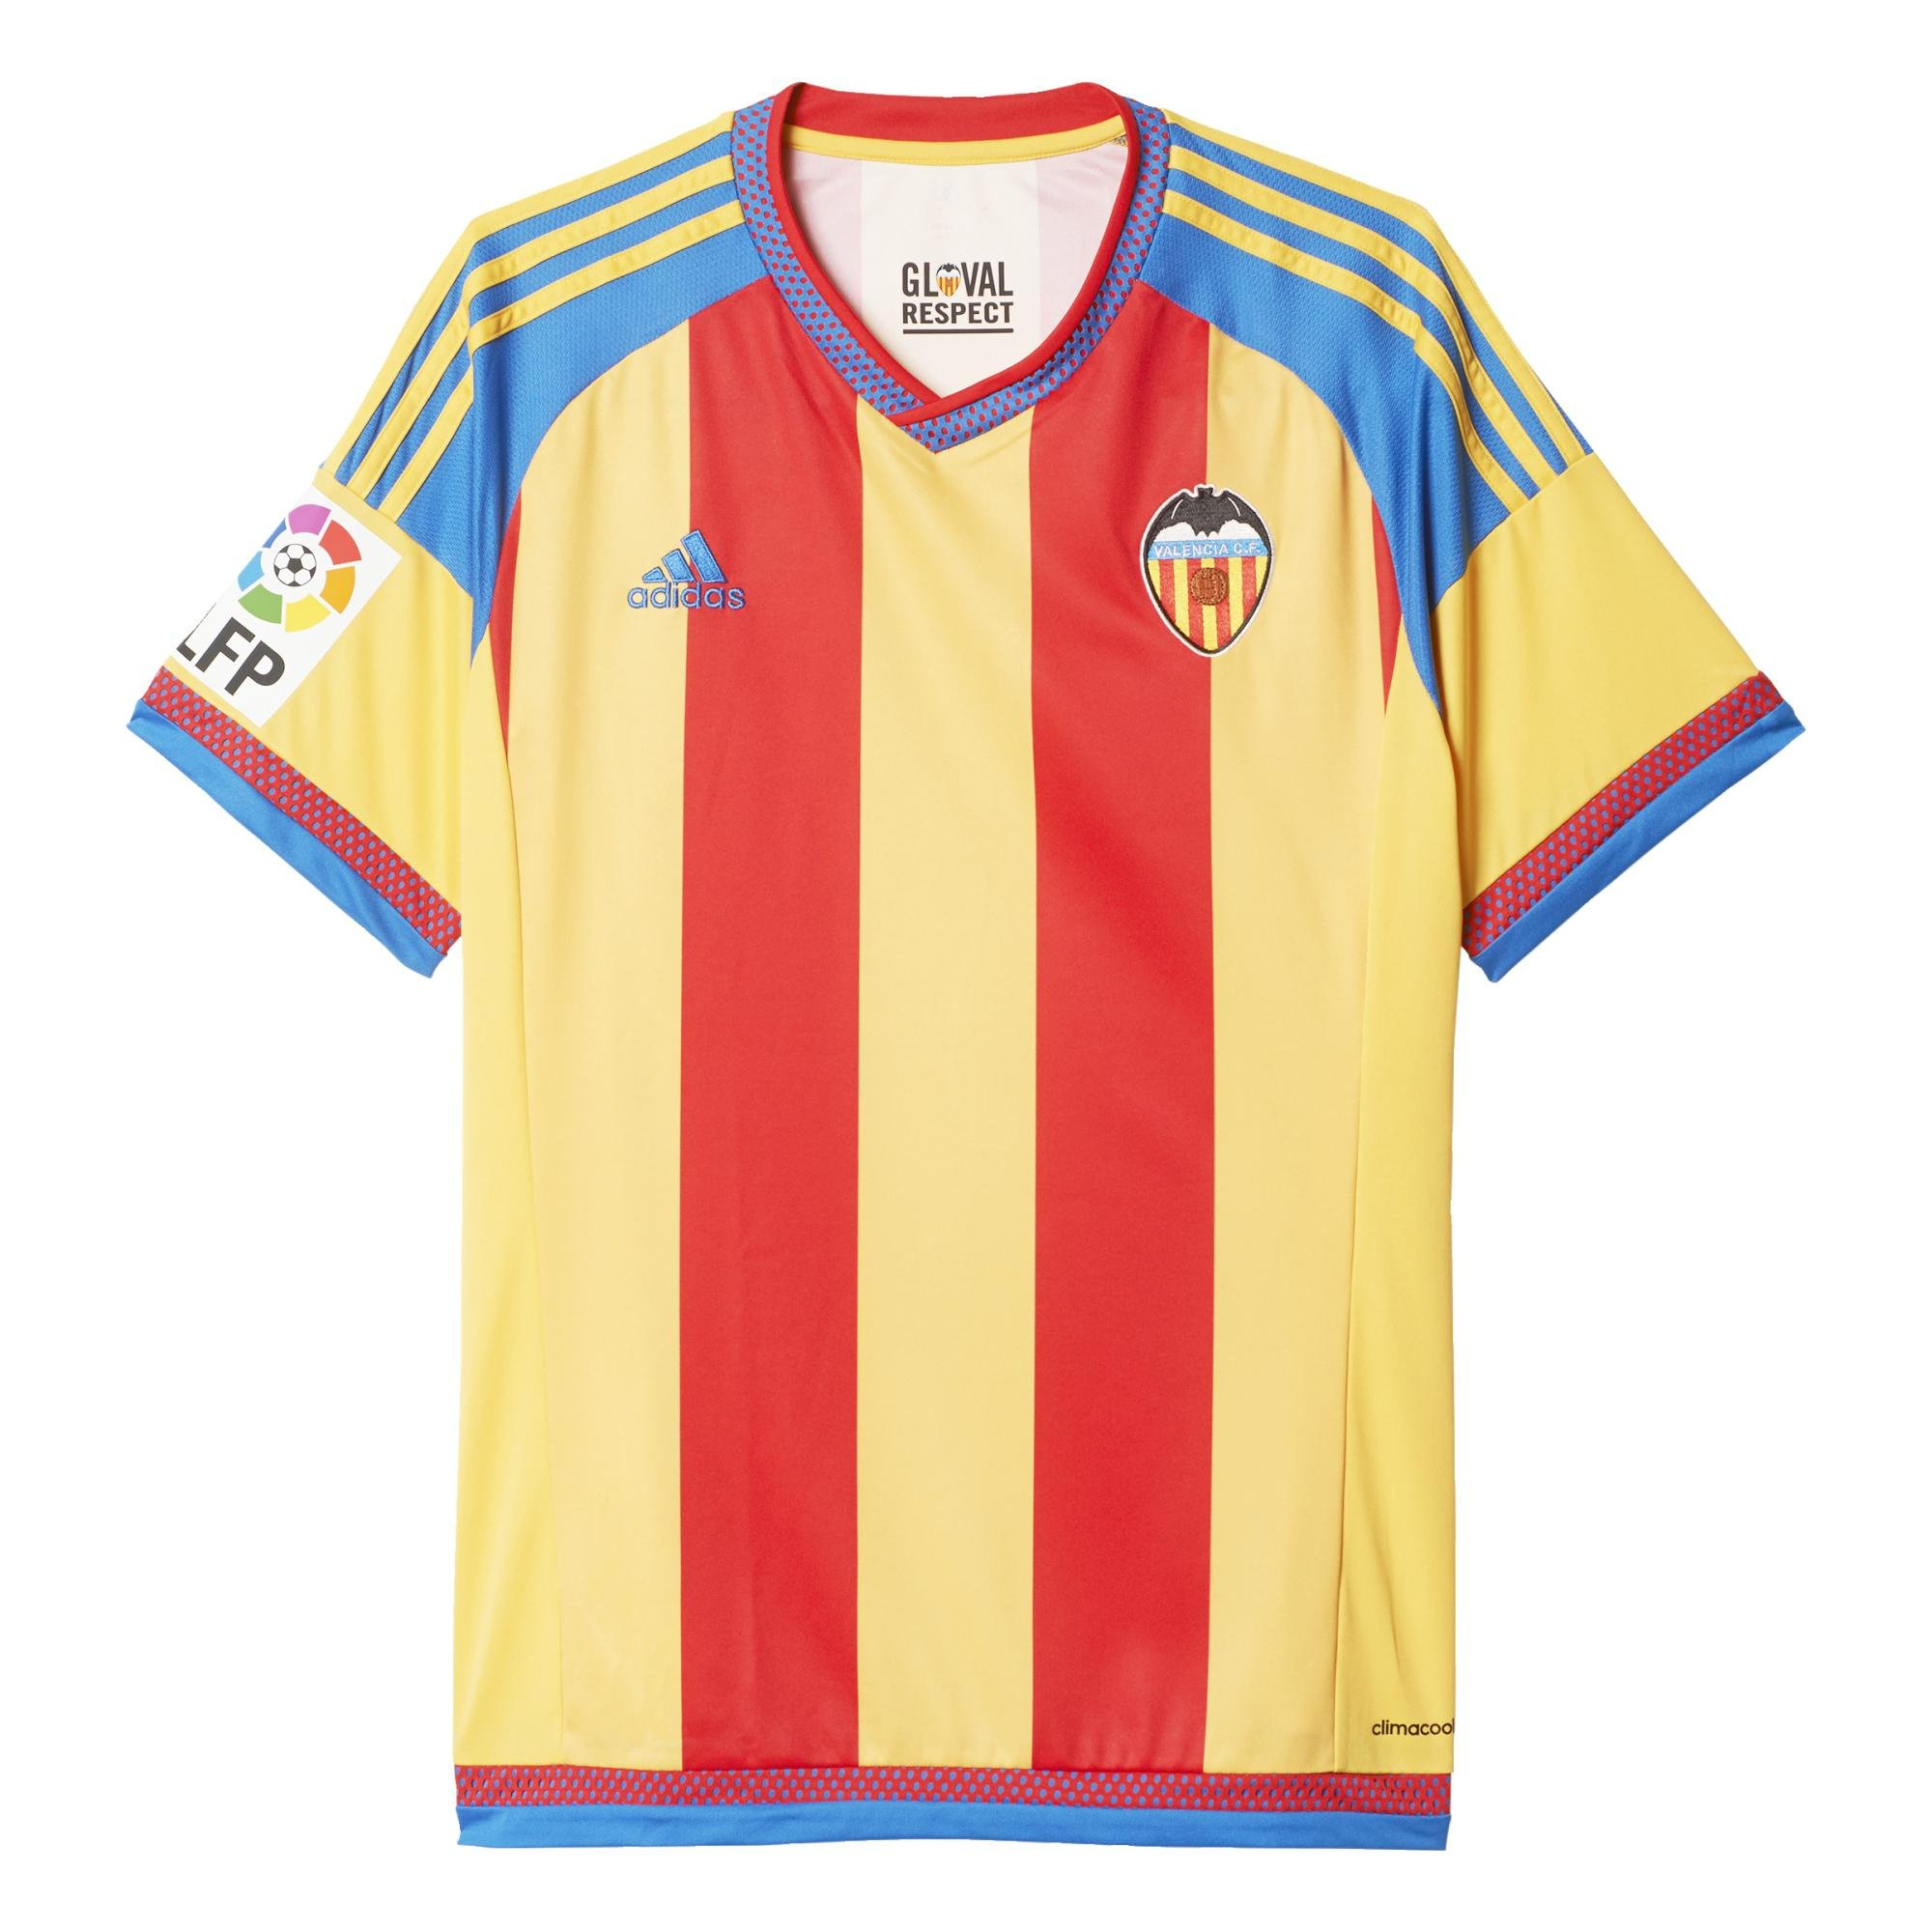 2º Equipación Valencia C.F 2015/2016 - Camiseta oficial adidas, talla M product image